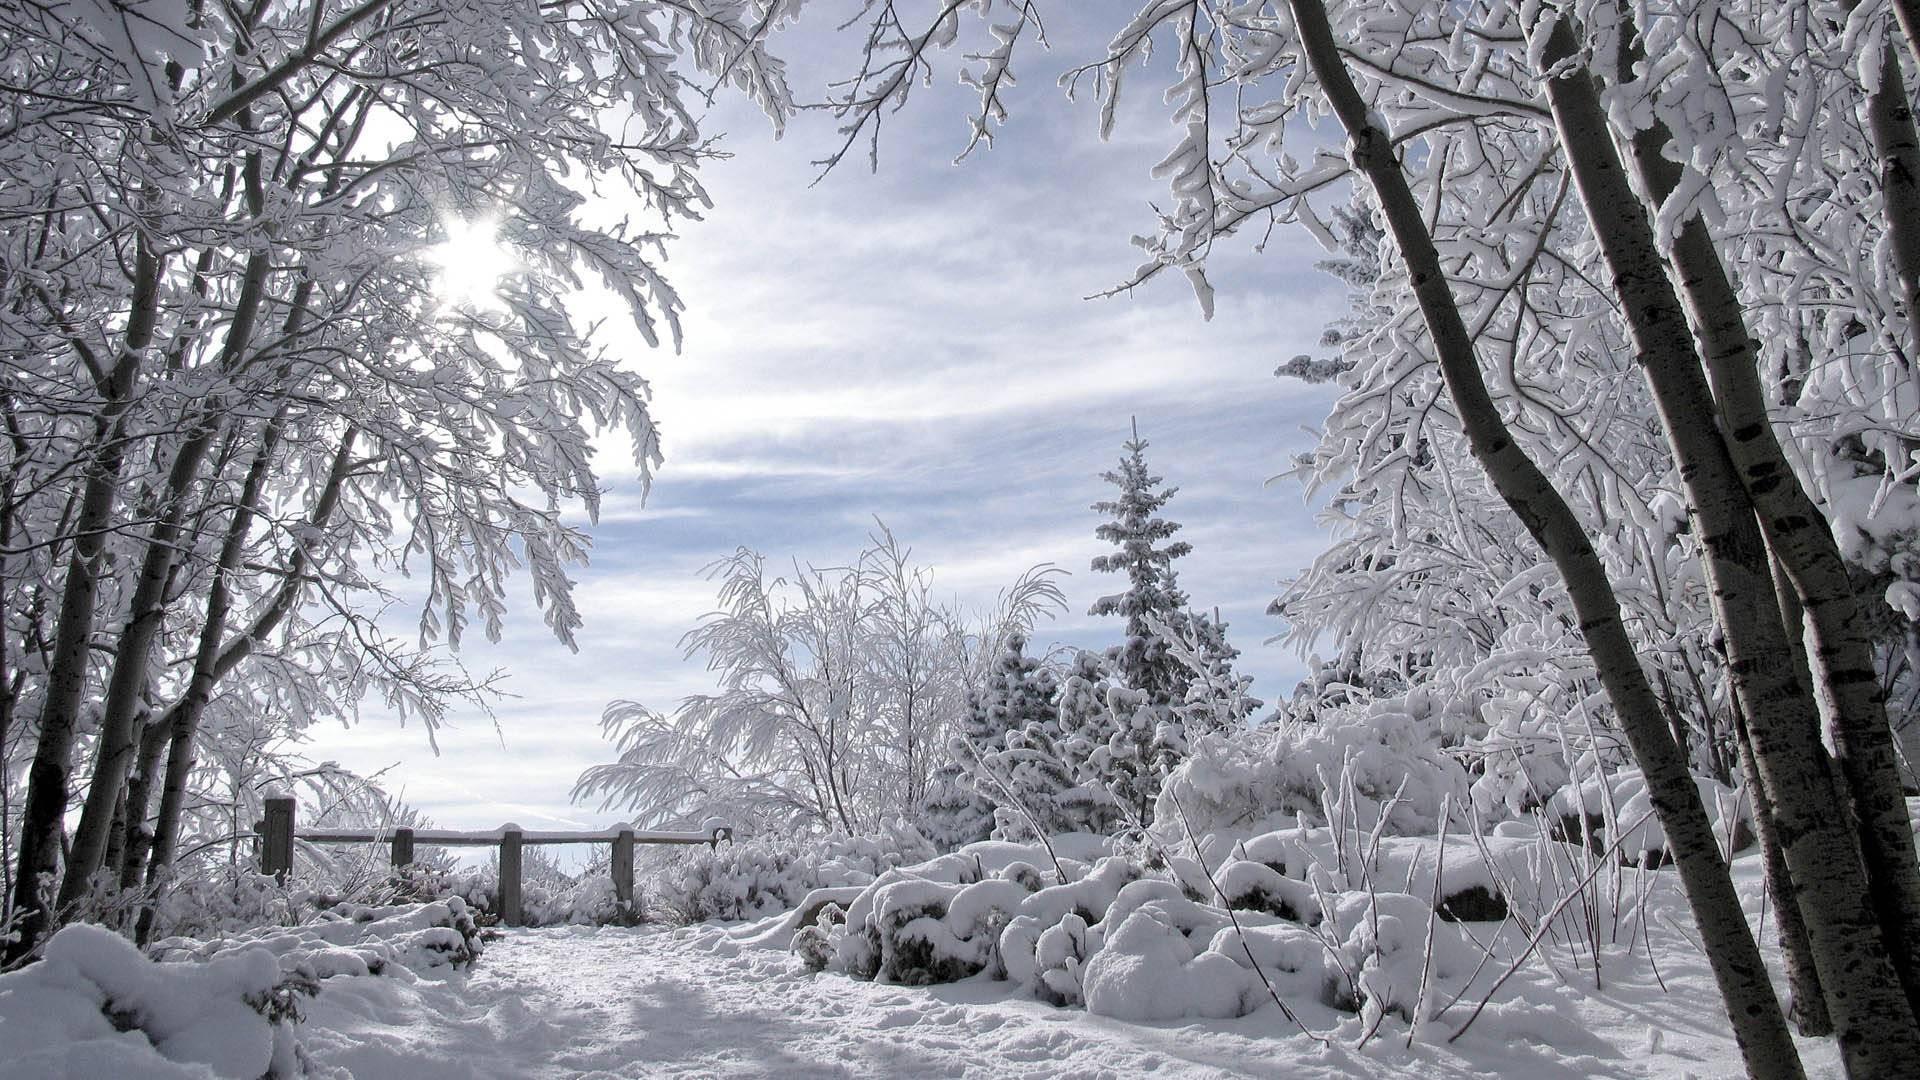 http://cdn.oboi7.com/d2aae9d7a8744625905b8d297612d6c36da286d3/pejzazhi-priroda-zima-sneg-derevya-gorizonty-zabory.jpg